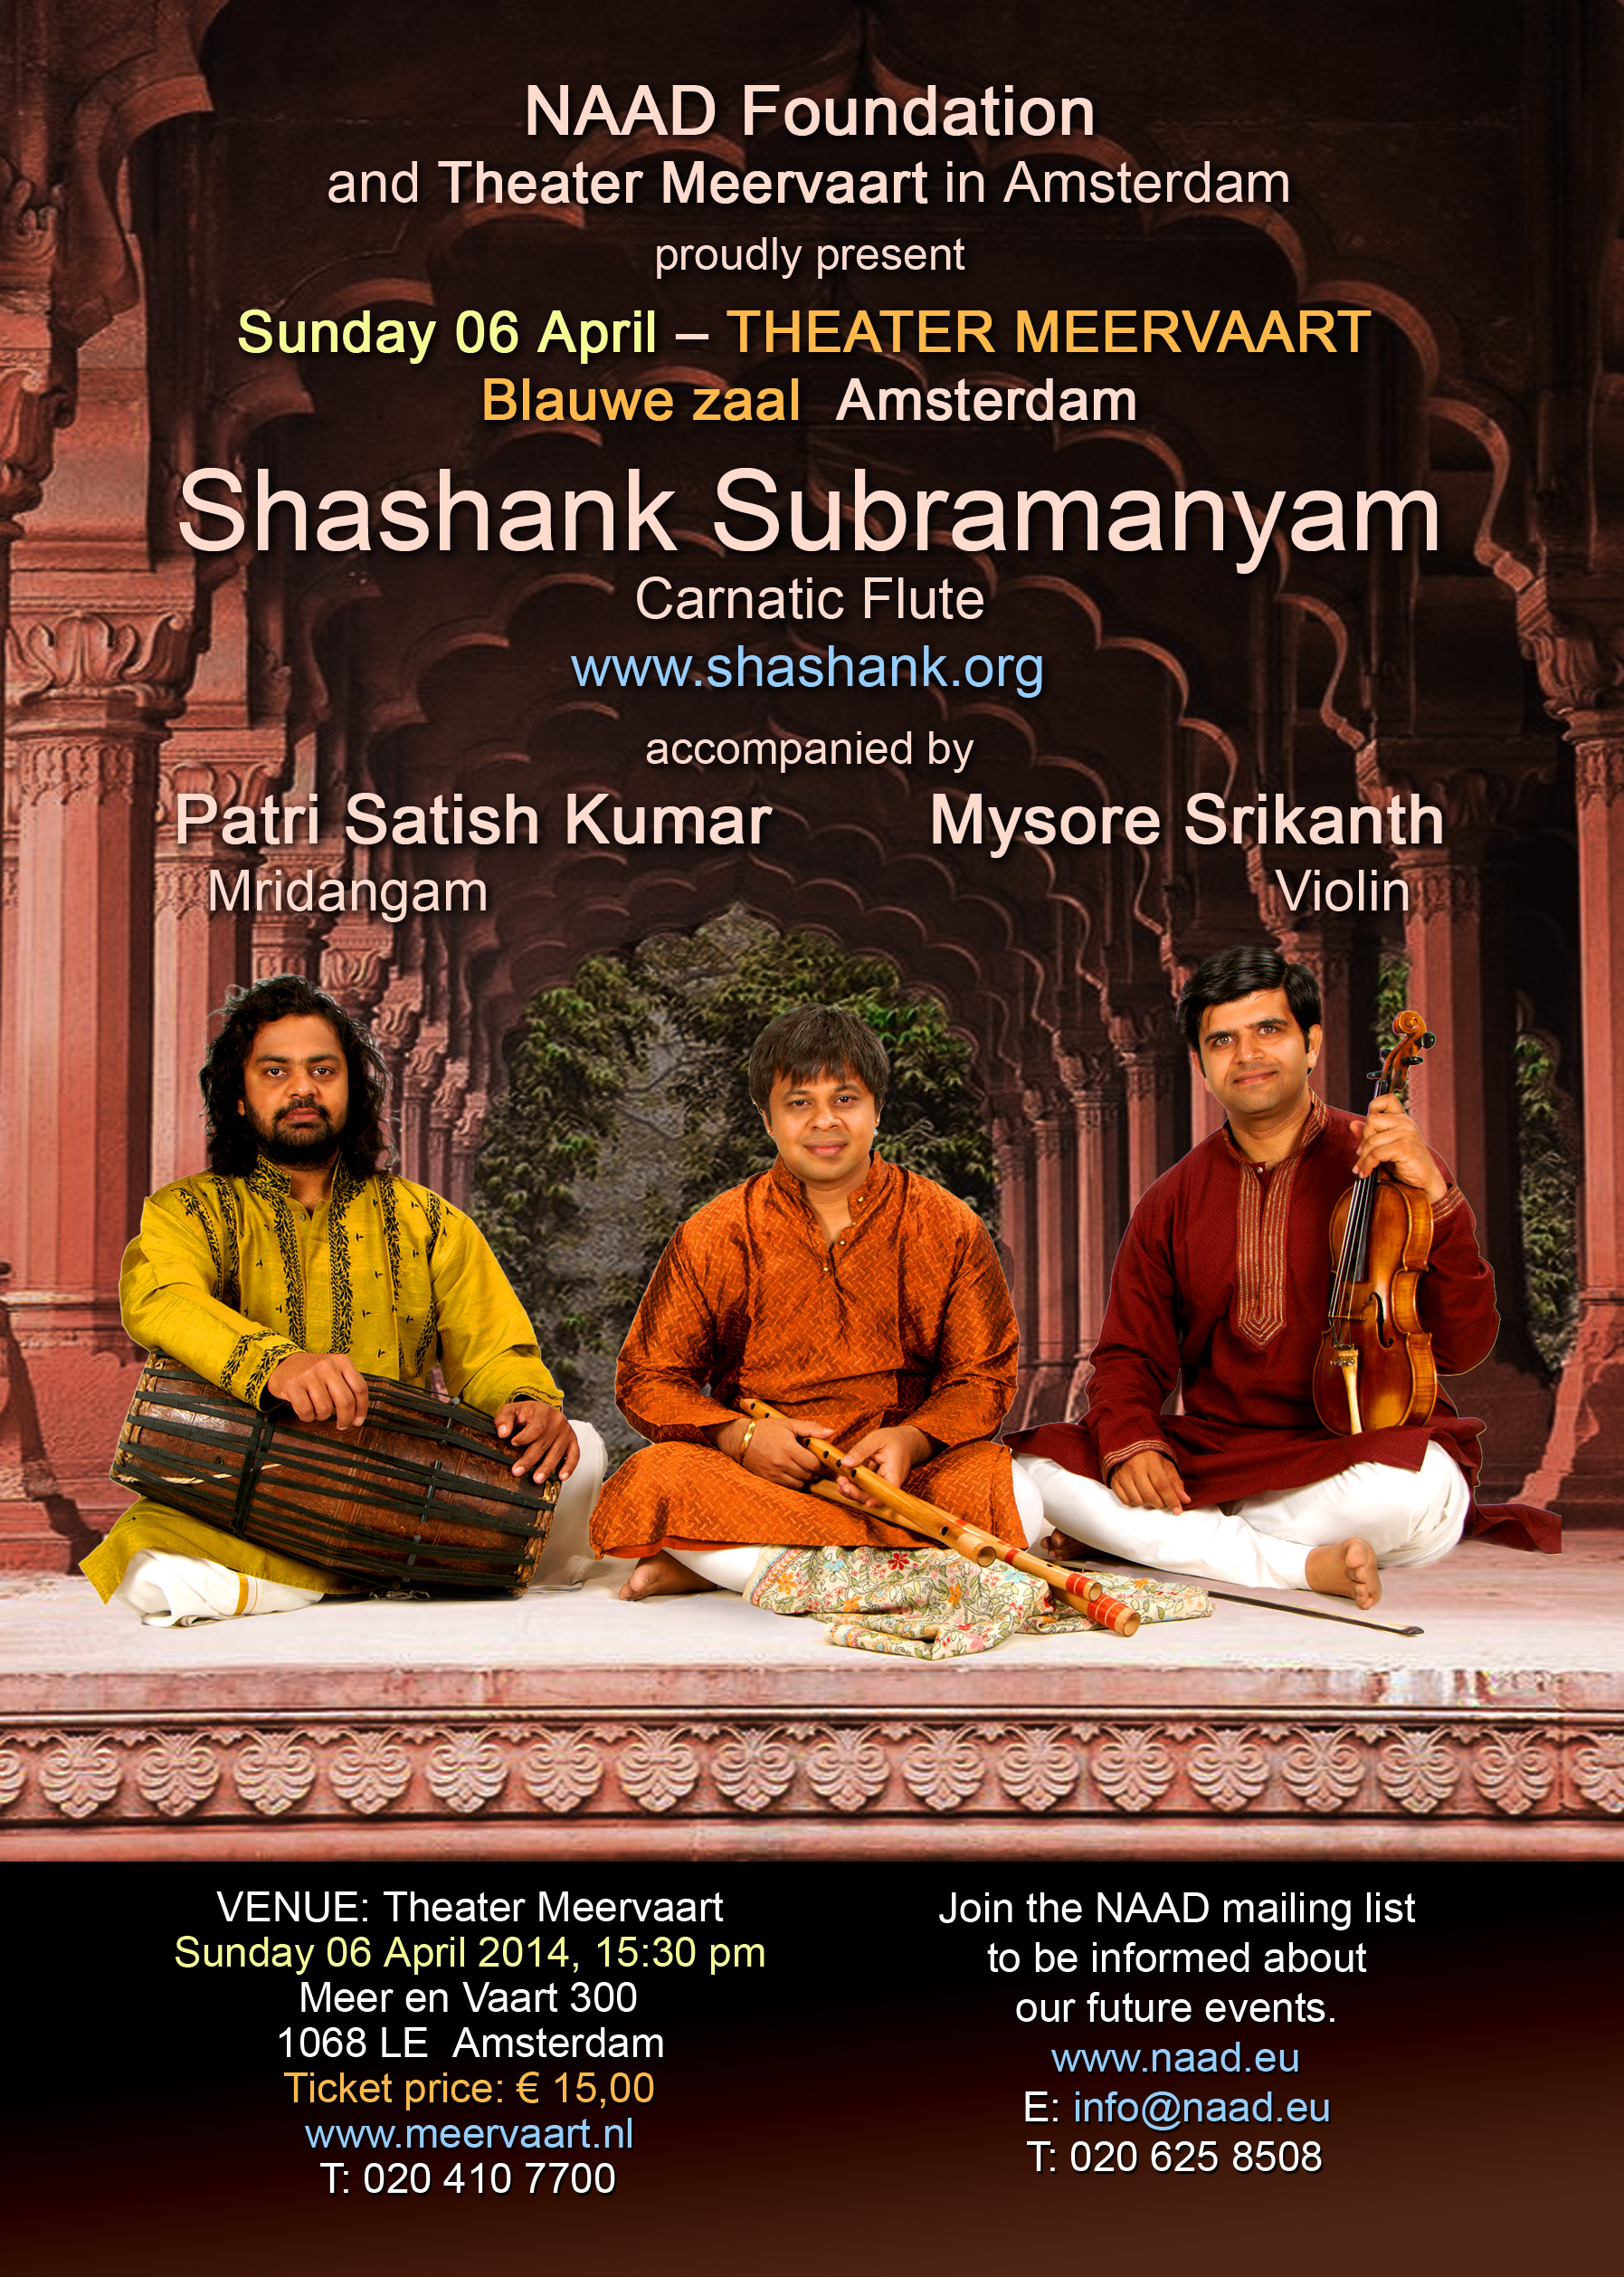 NAAD concert April 2014 - Shashank Subramanyam